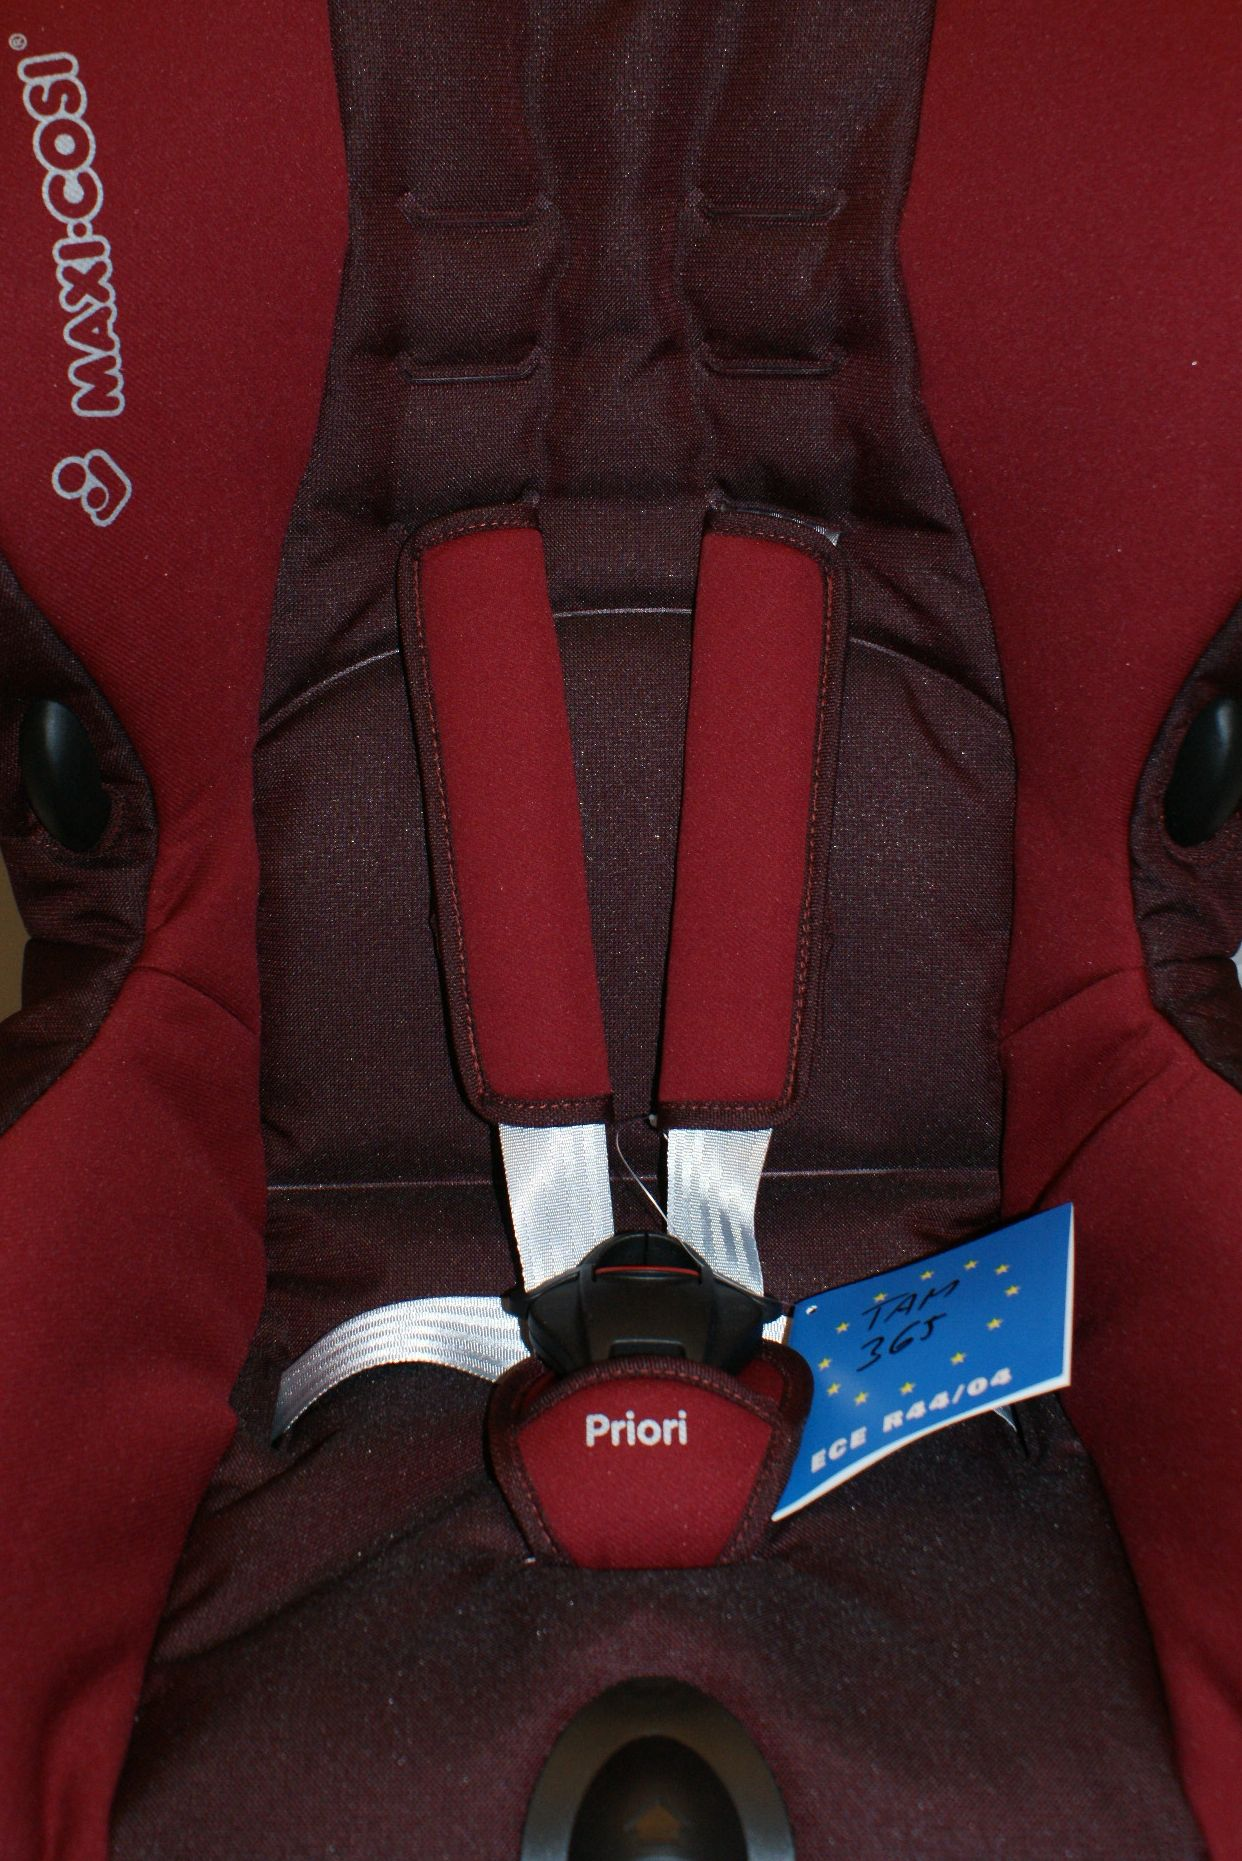 maxi cosi priori sps kindersitz autositz 9 18 kg rot carmine ebay. Black Bedroom Furniture Sets. Home Design Ideas